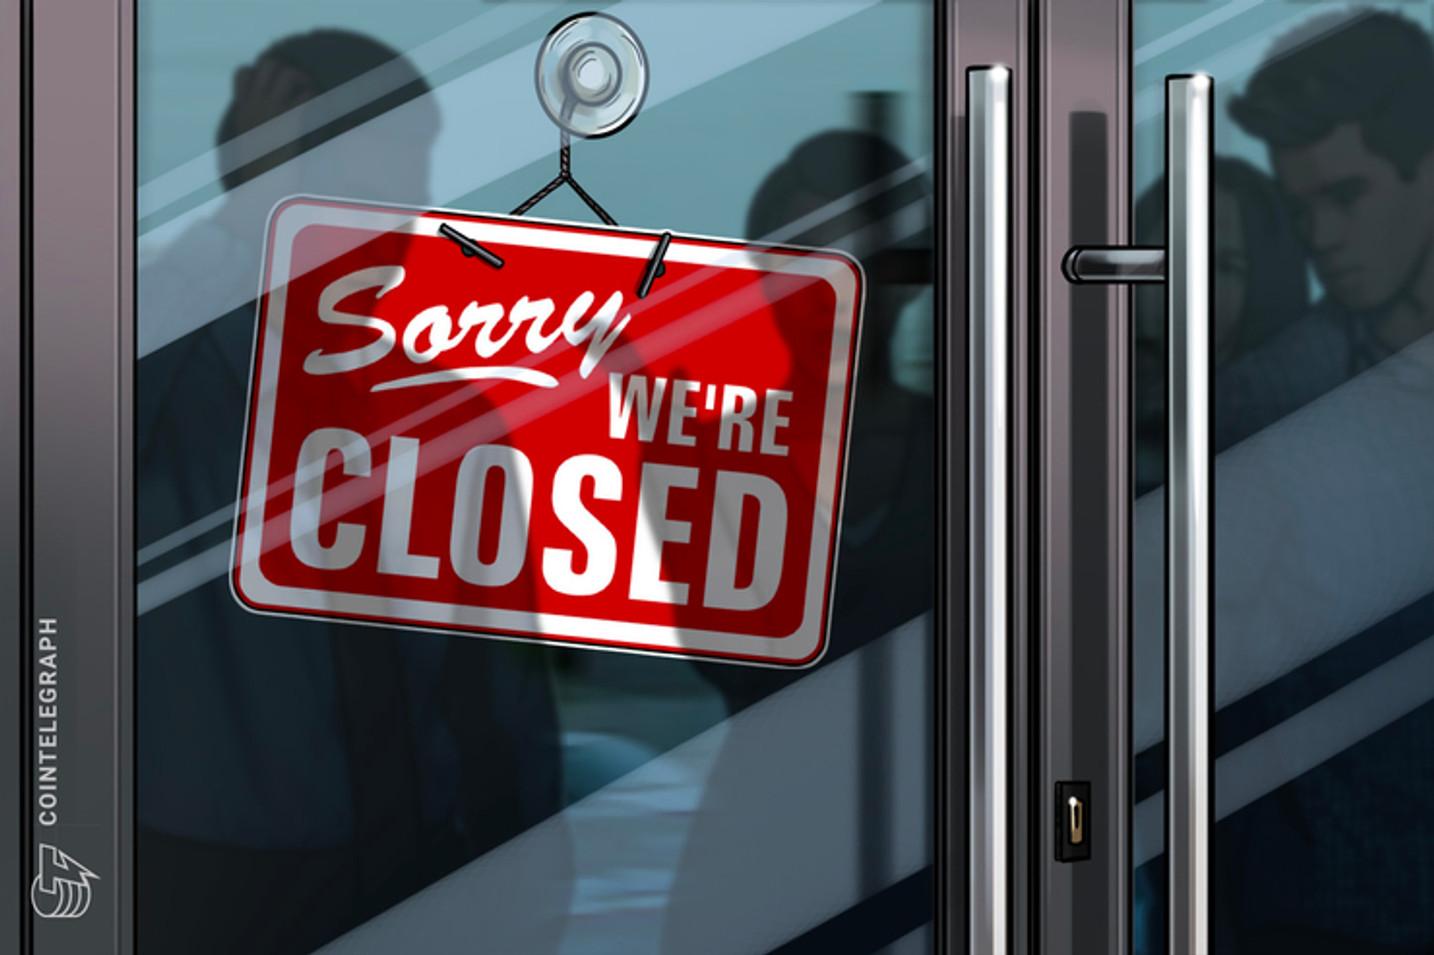 Top5 암호화폐 거래소 코인네스트, 대표 횡령 문제로 결국 '문 닫아'